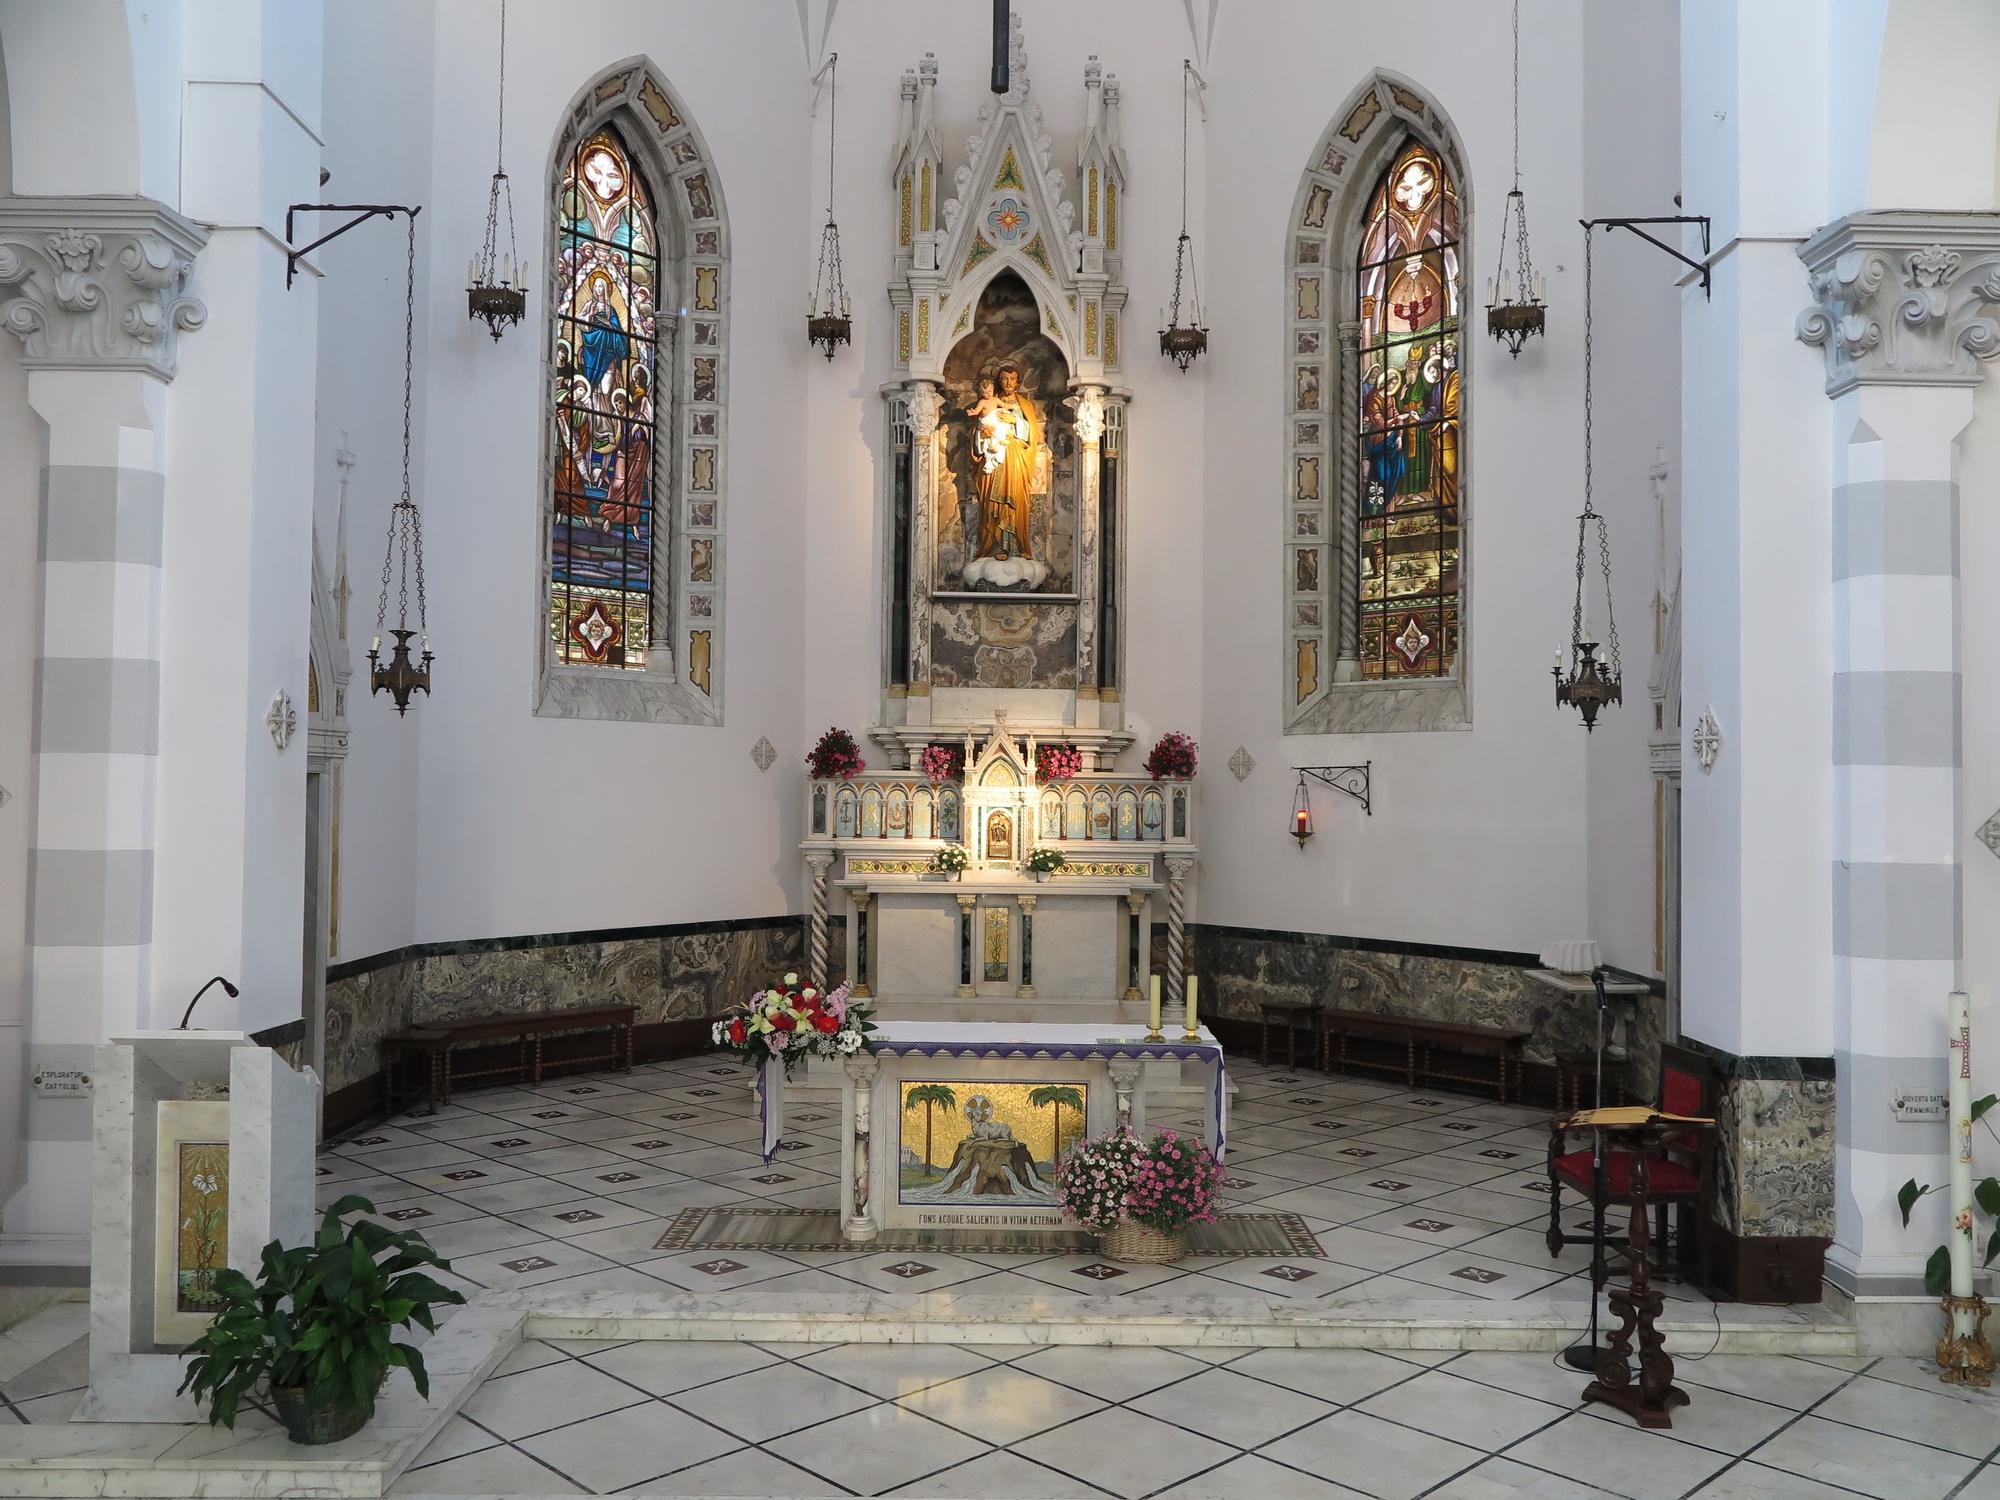 chiesa-san-giuseppe-2016-03-18-14-58-52